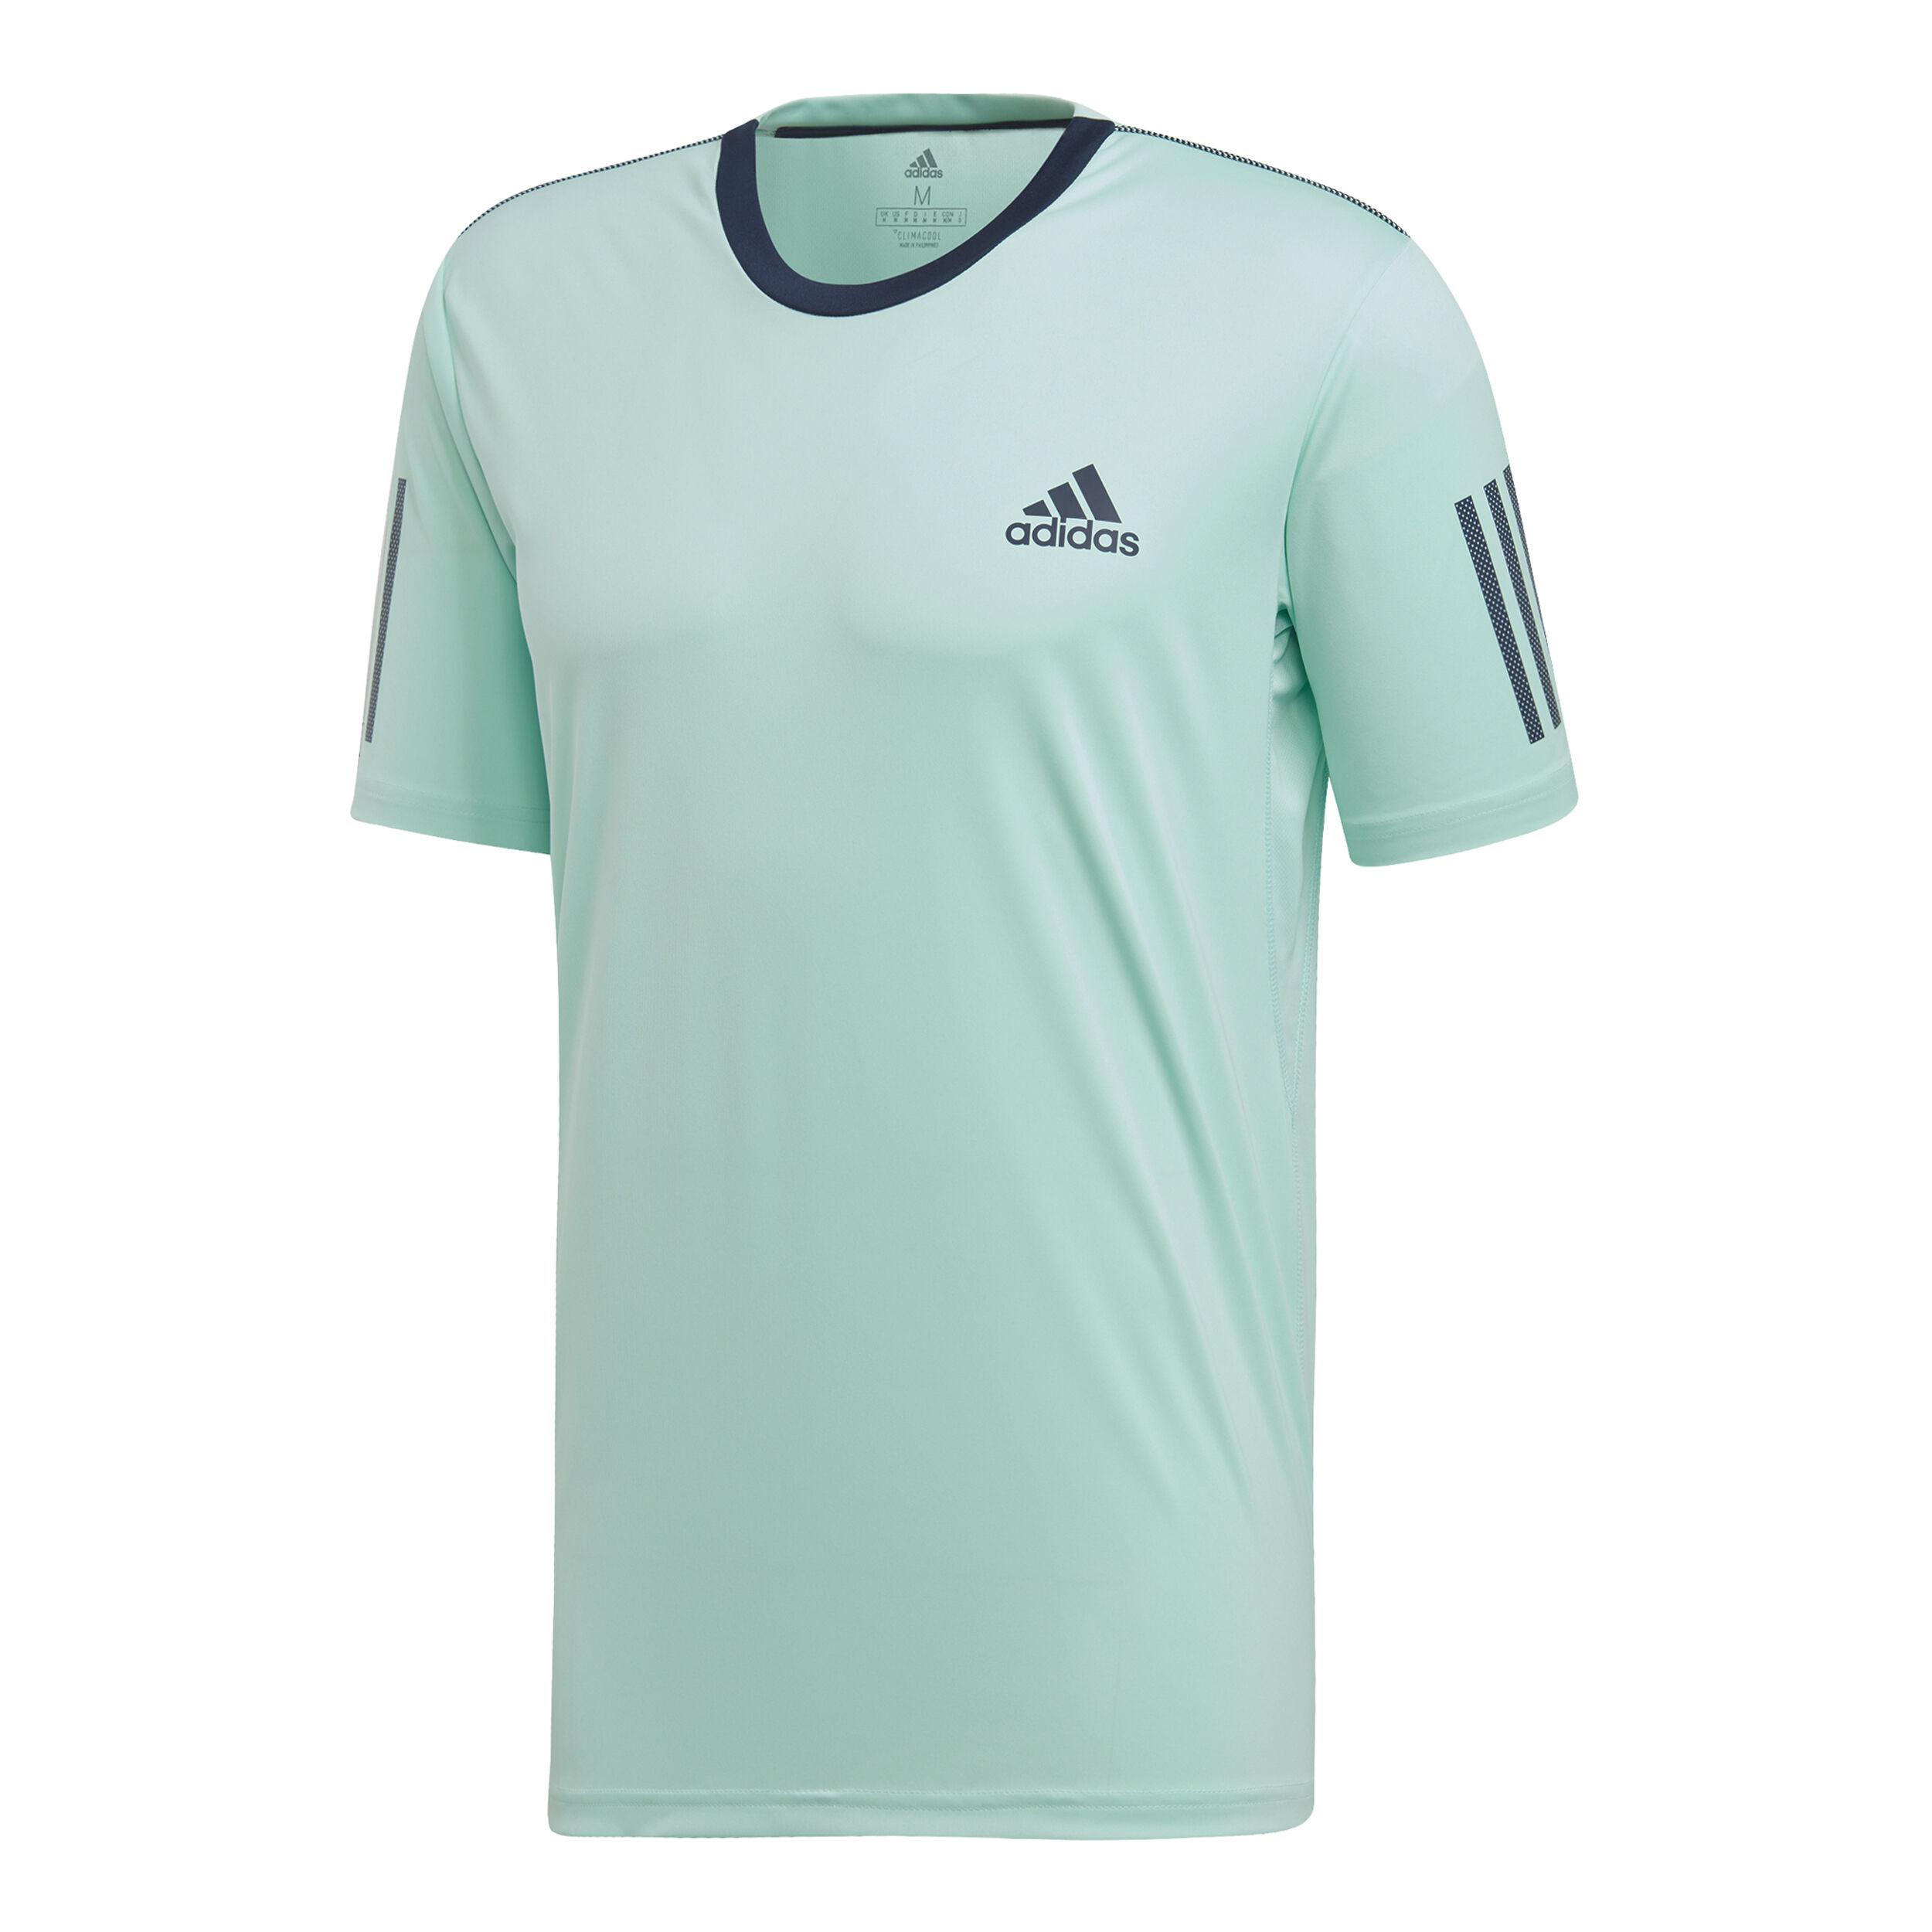 adidas Club 3 Stripes T Shirt Herren Mint, Dunkelblau